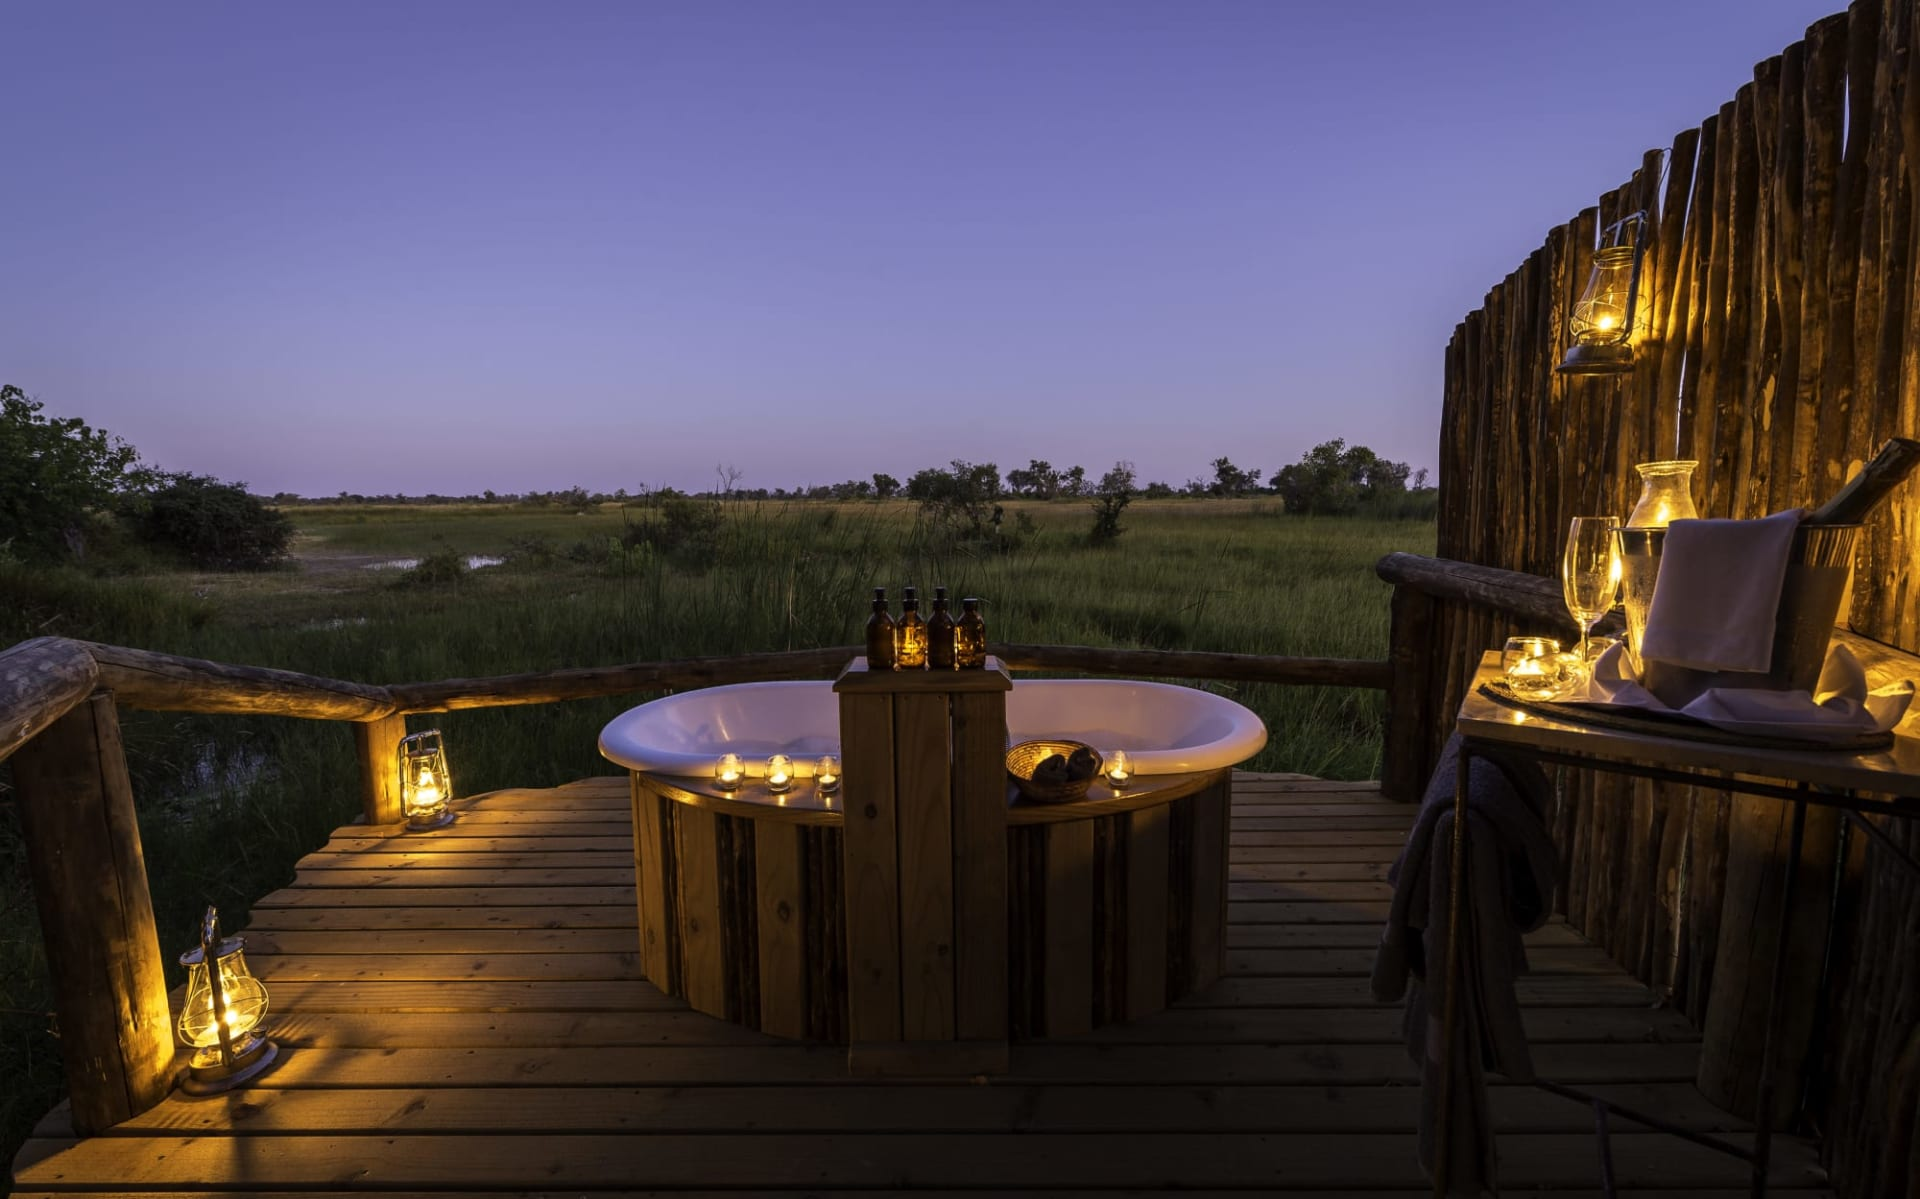 Little Vumbura in Okavango Delta:  Little Vumbura Camp